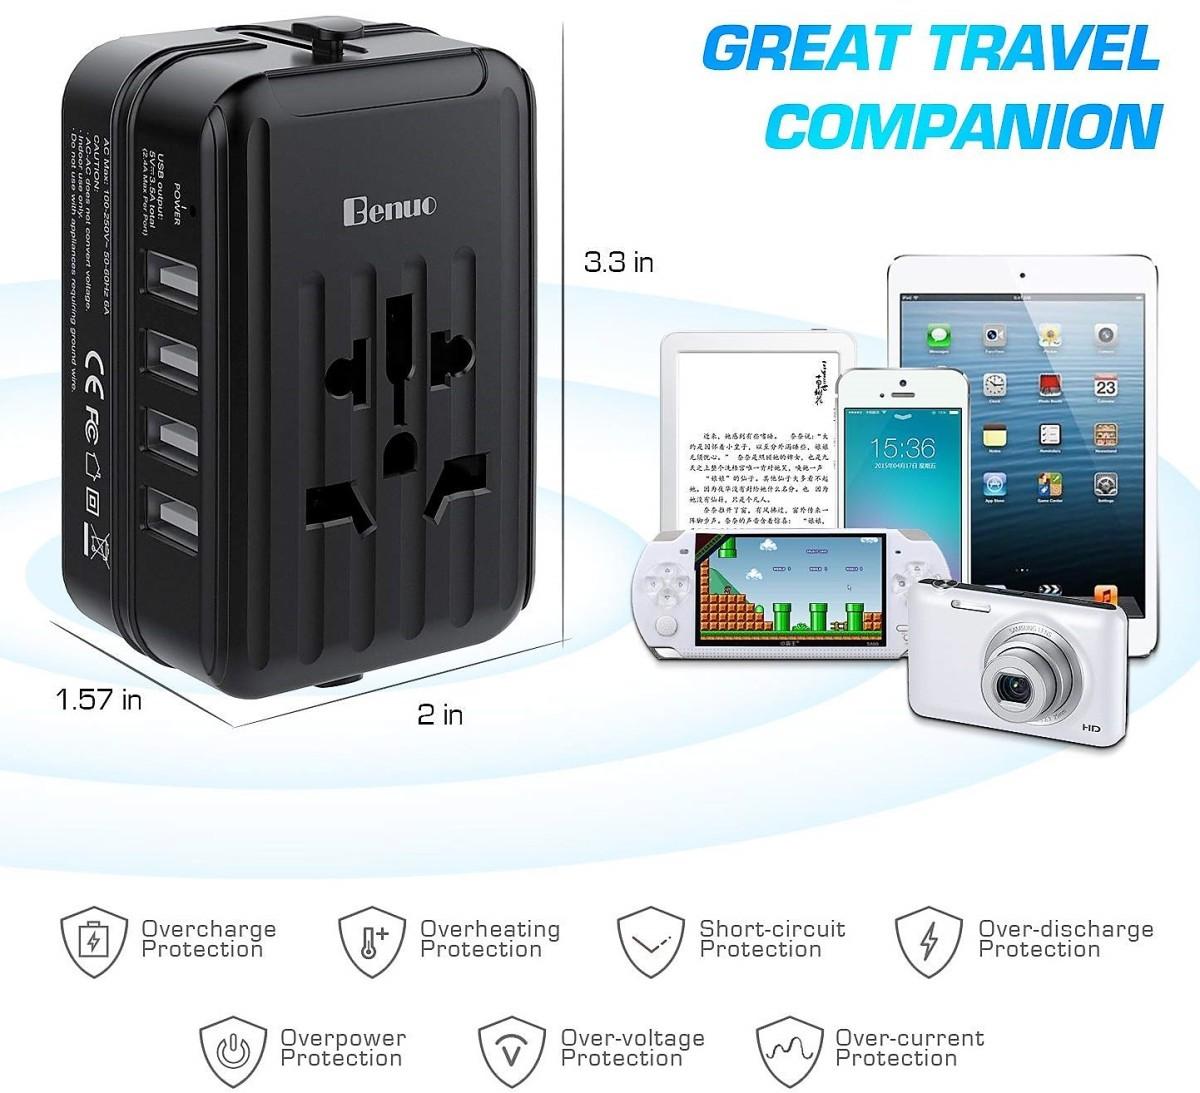 Benuo Worldwide Travel Adapter